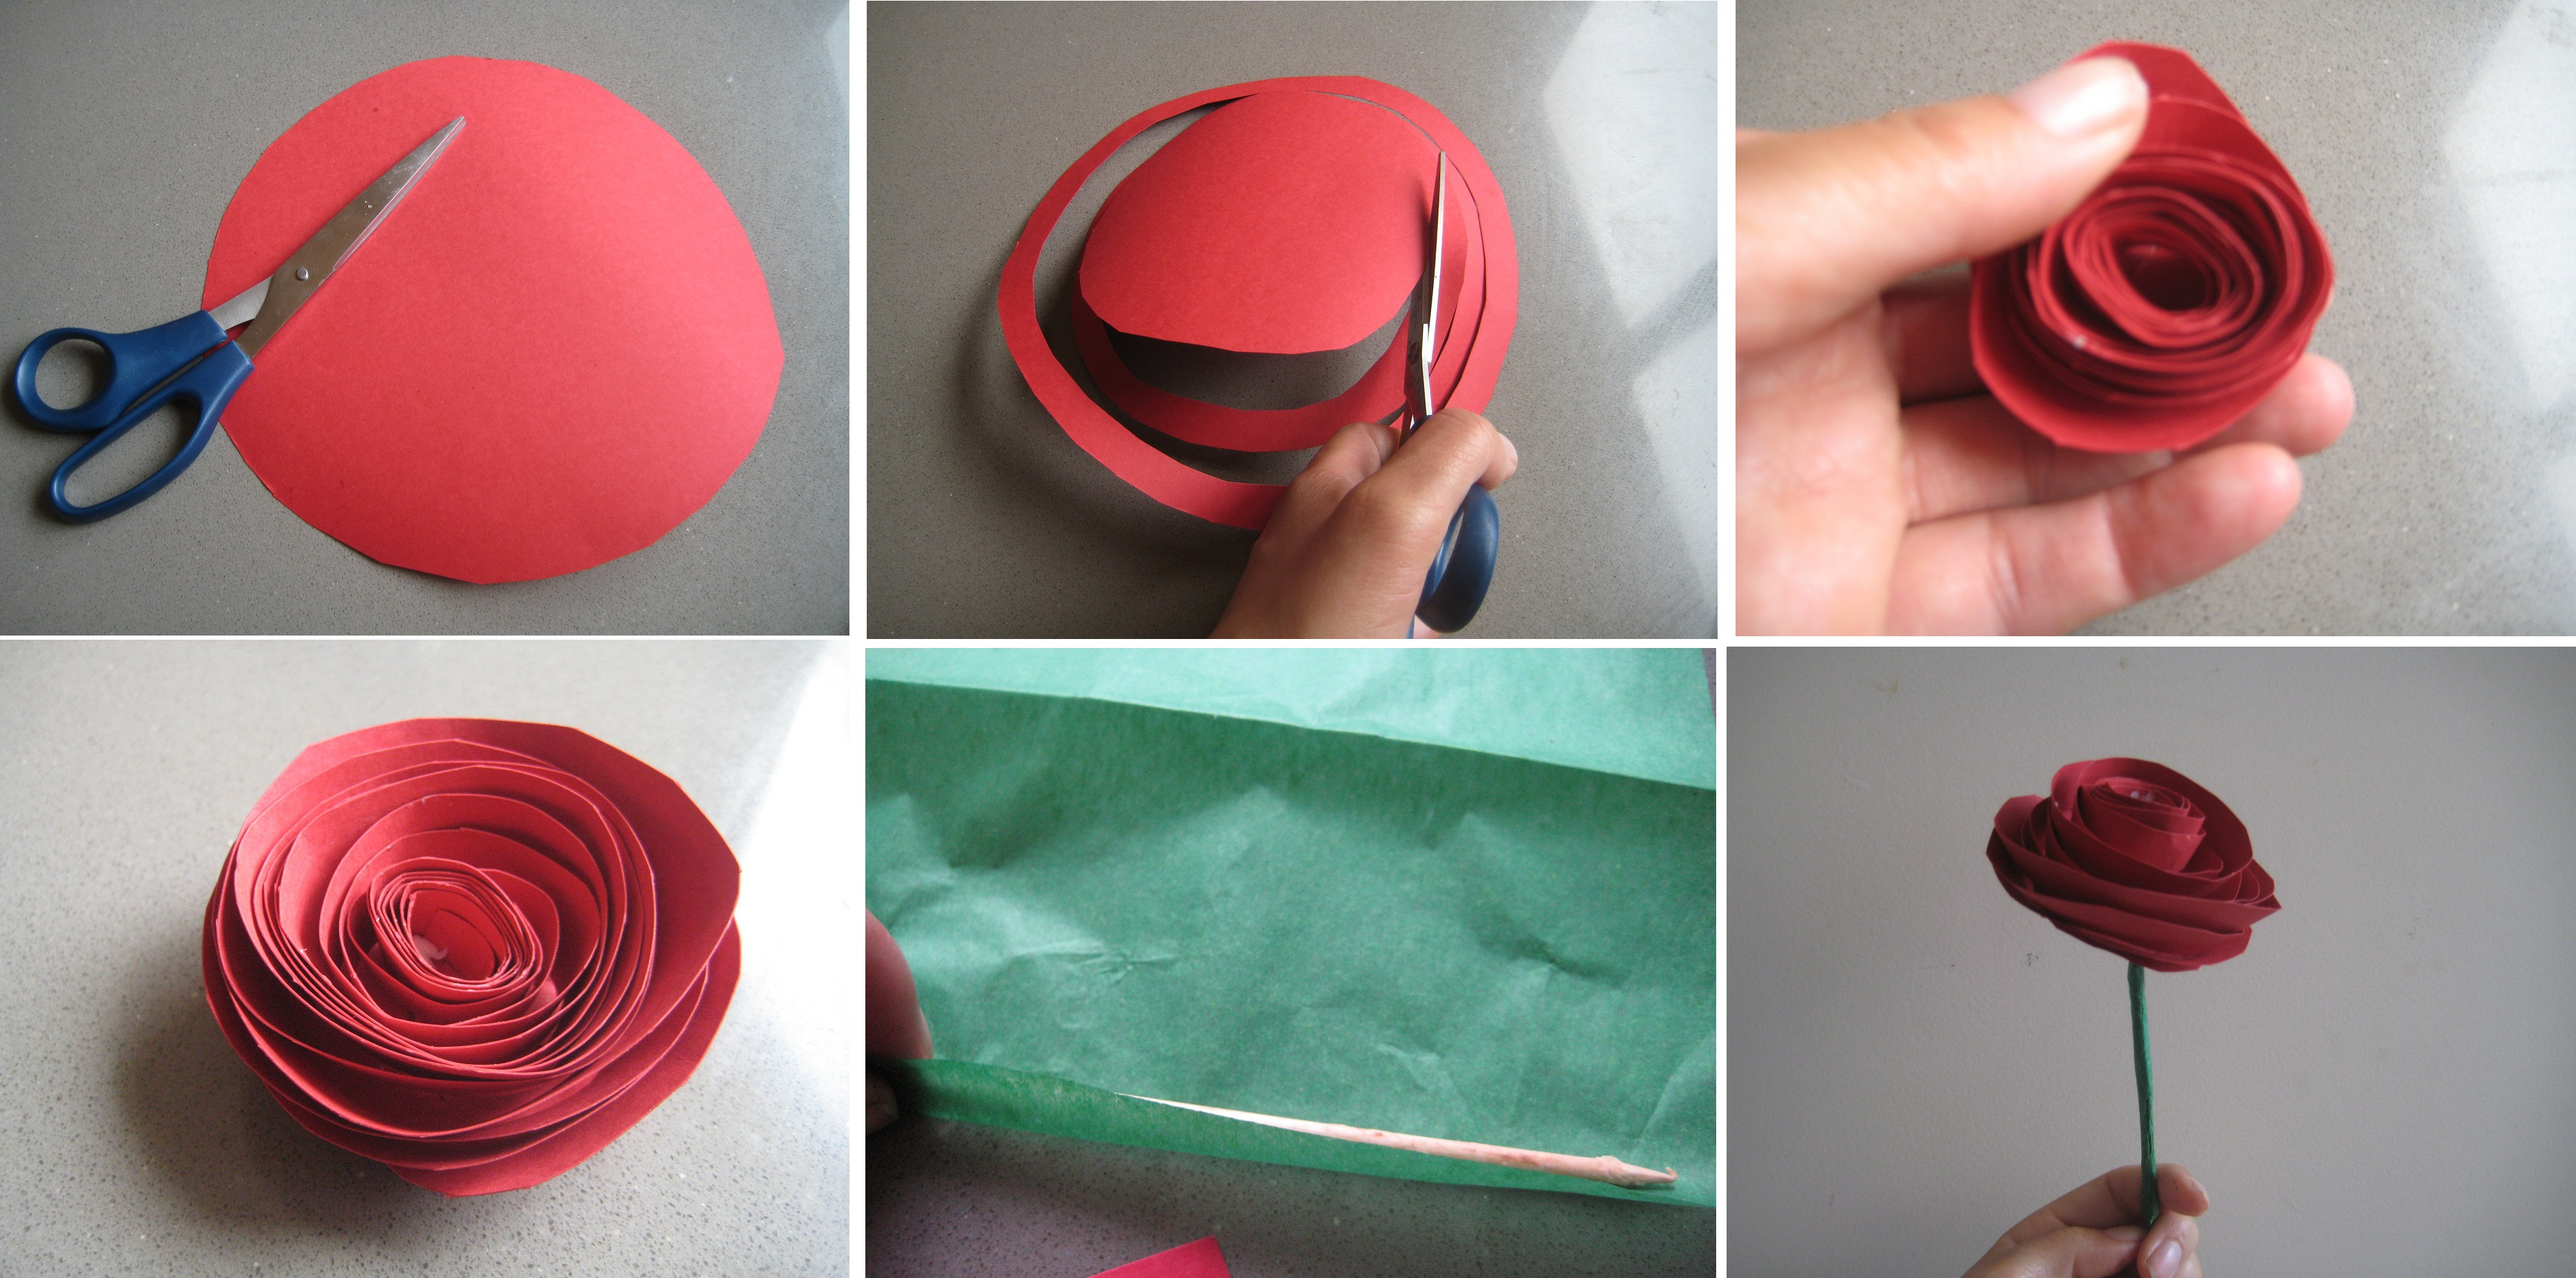 Flores de papel rosa - Como hacer rosas de papel ...